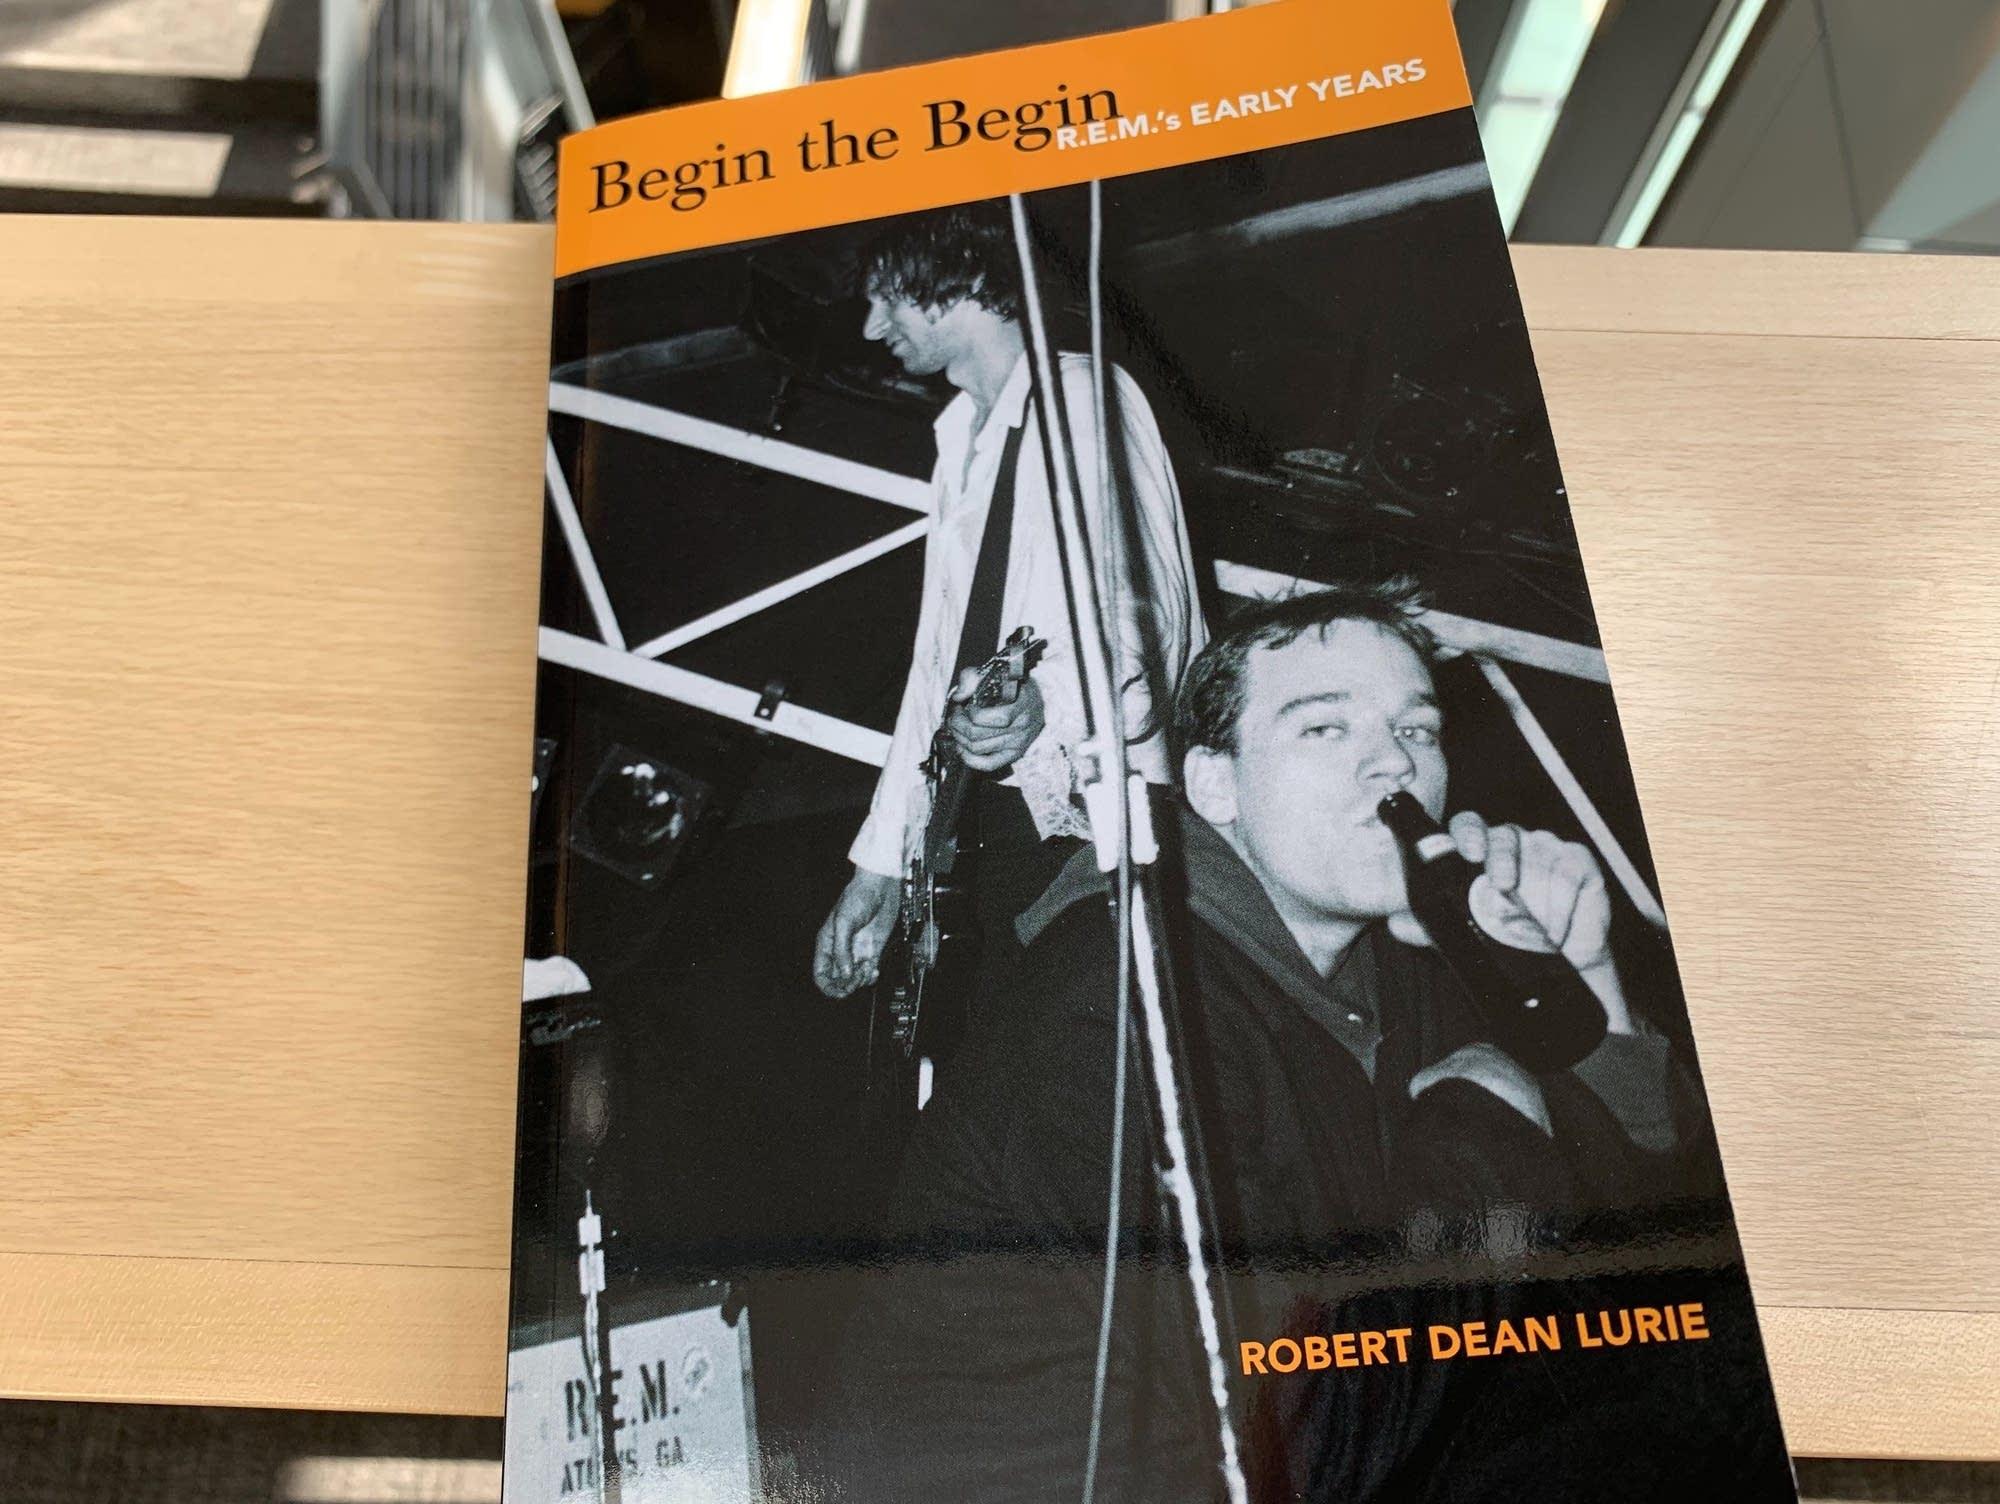 Robert Dean Lurie's 'Begin the Begin.'